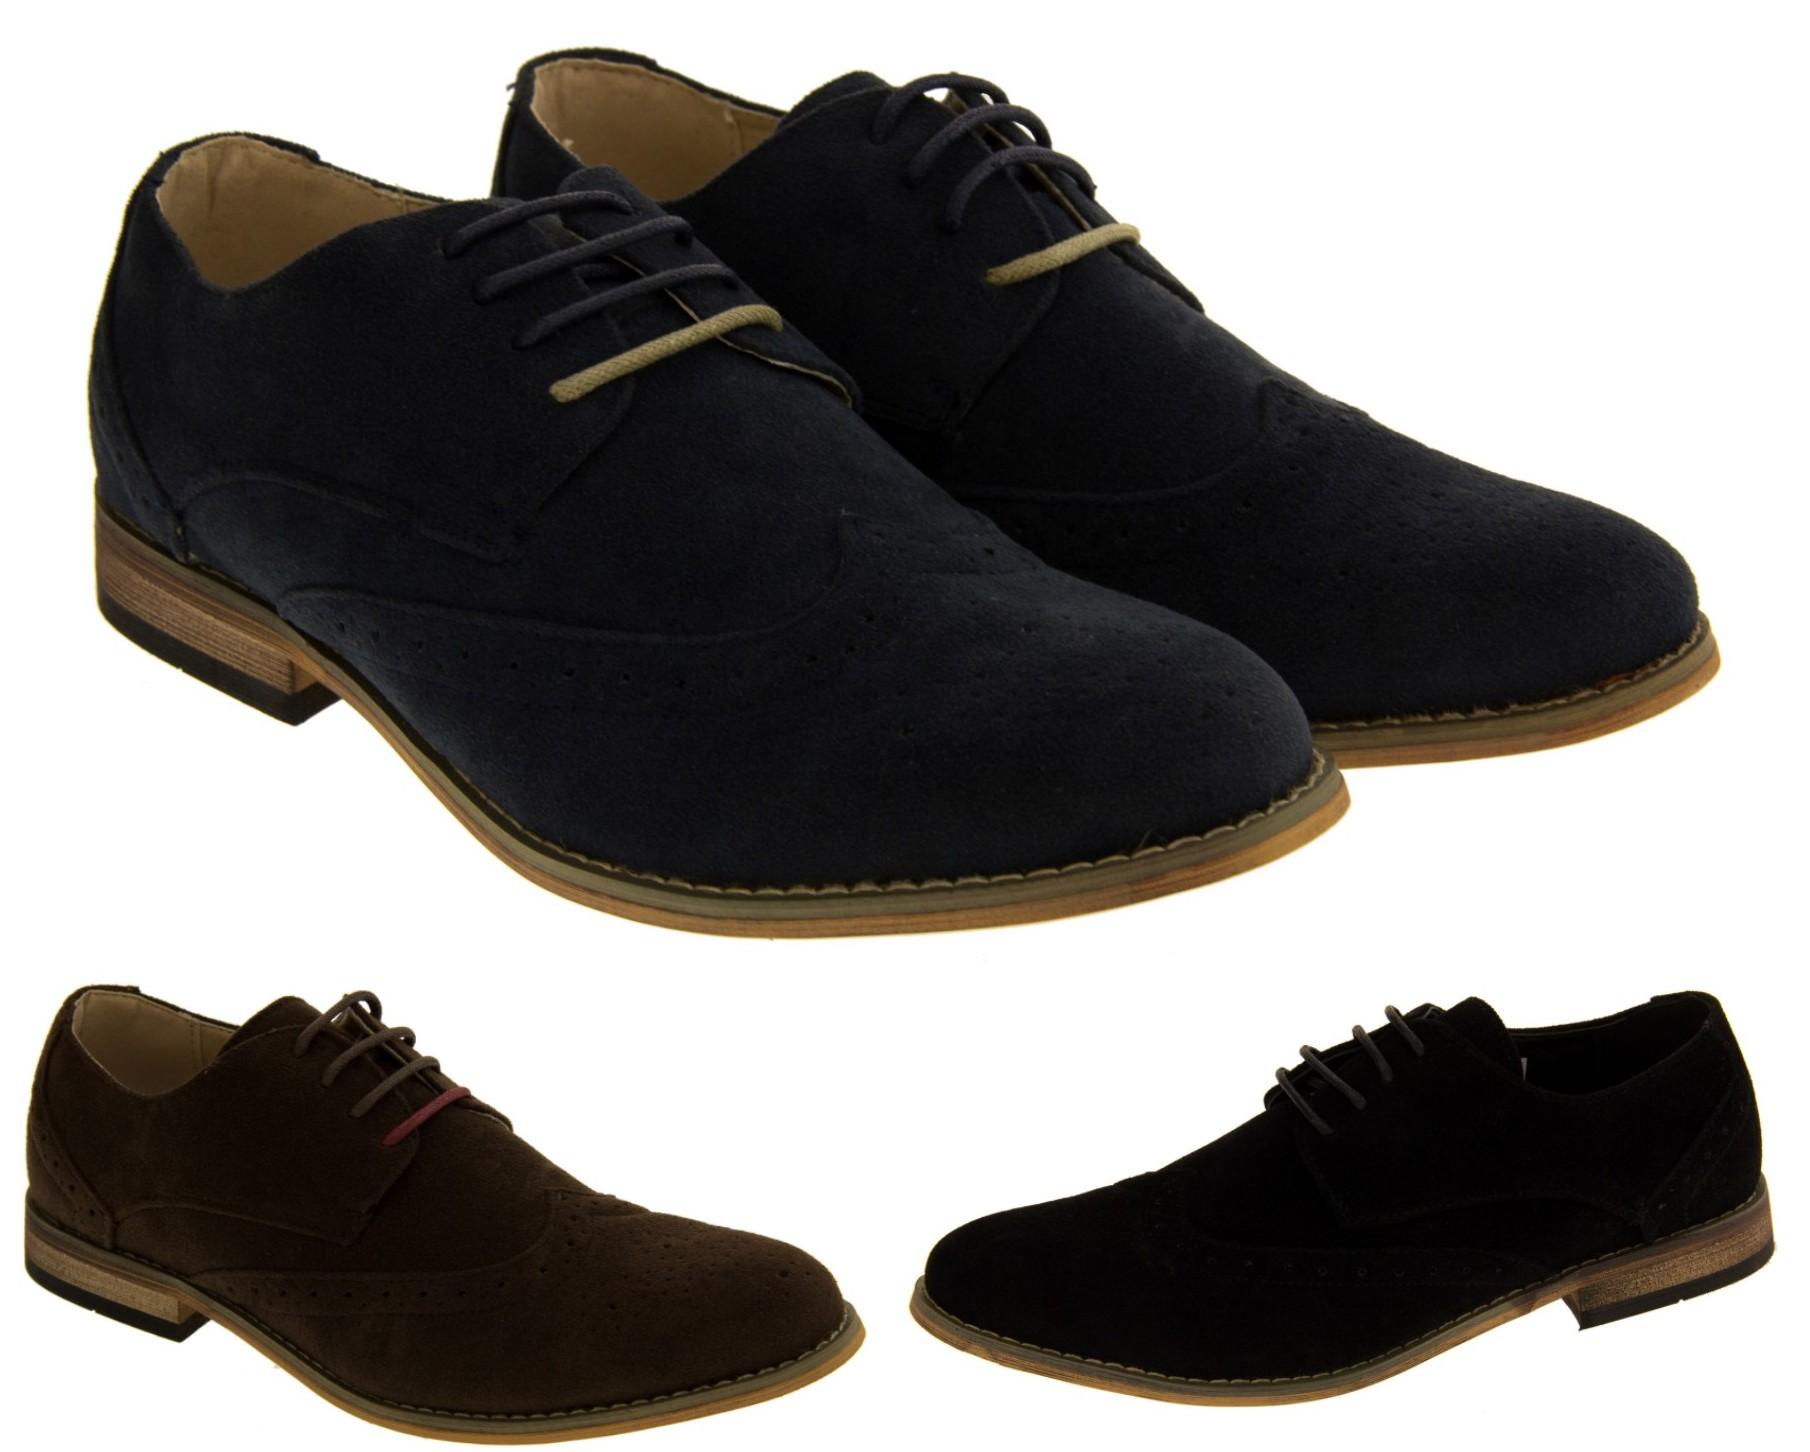 Manfield Shoes Uk